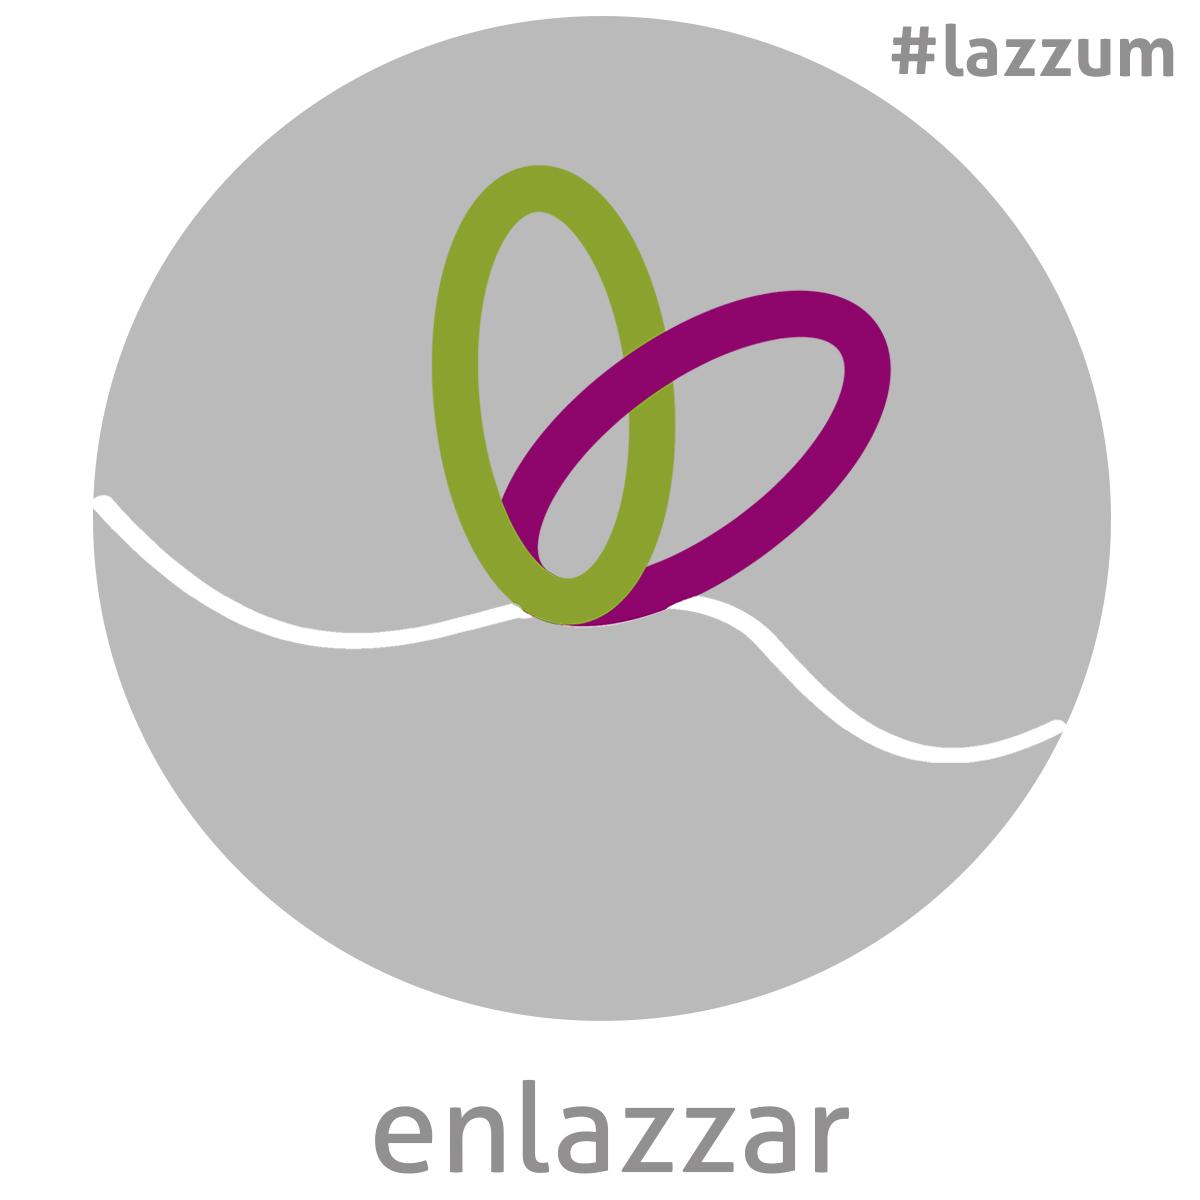 Símbolo_enlazzar&LogoLazzum